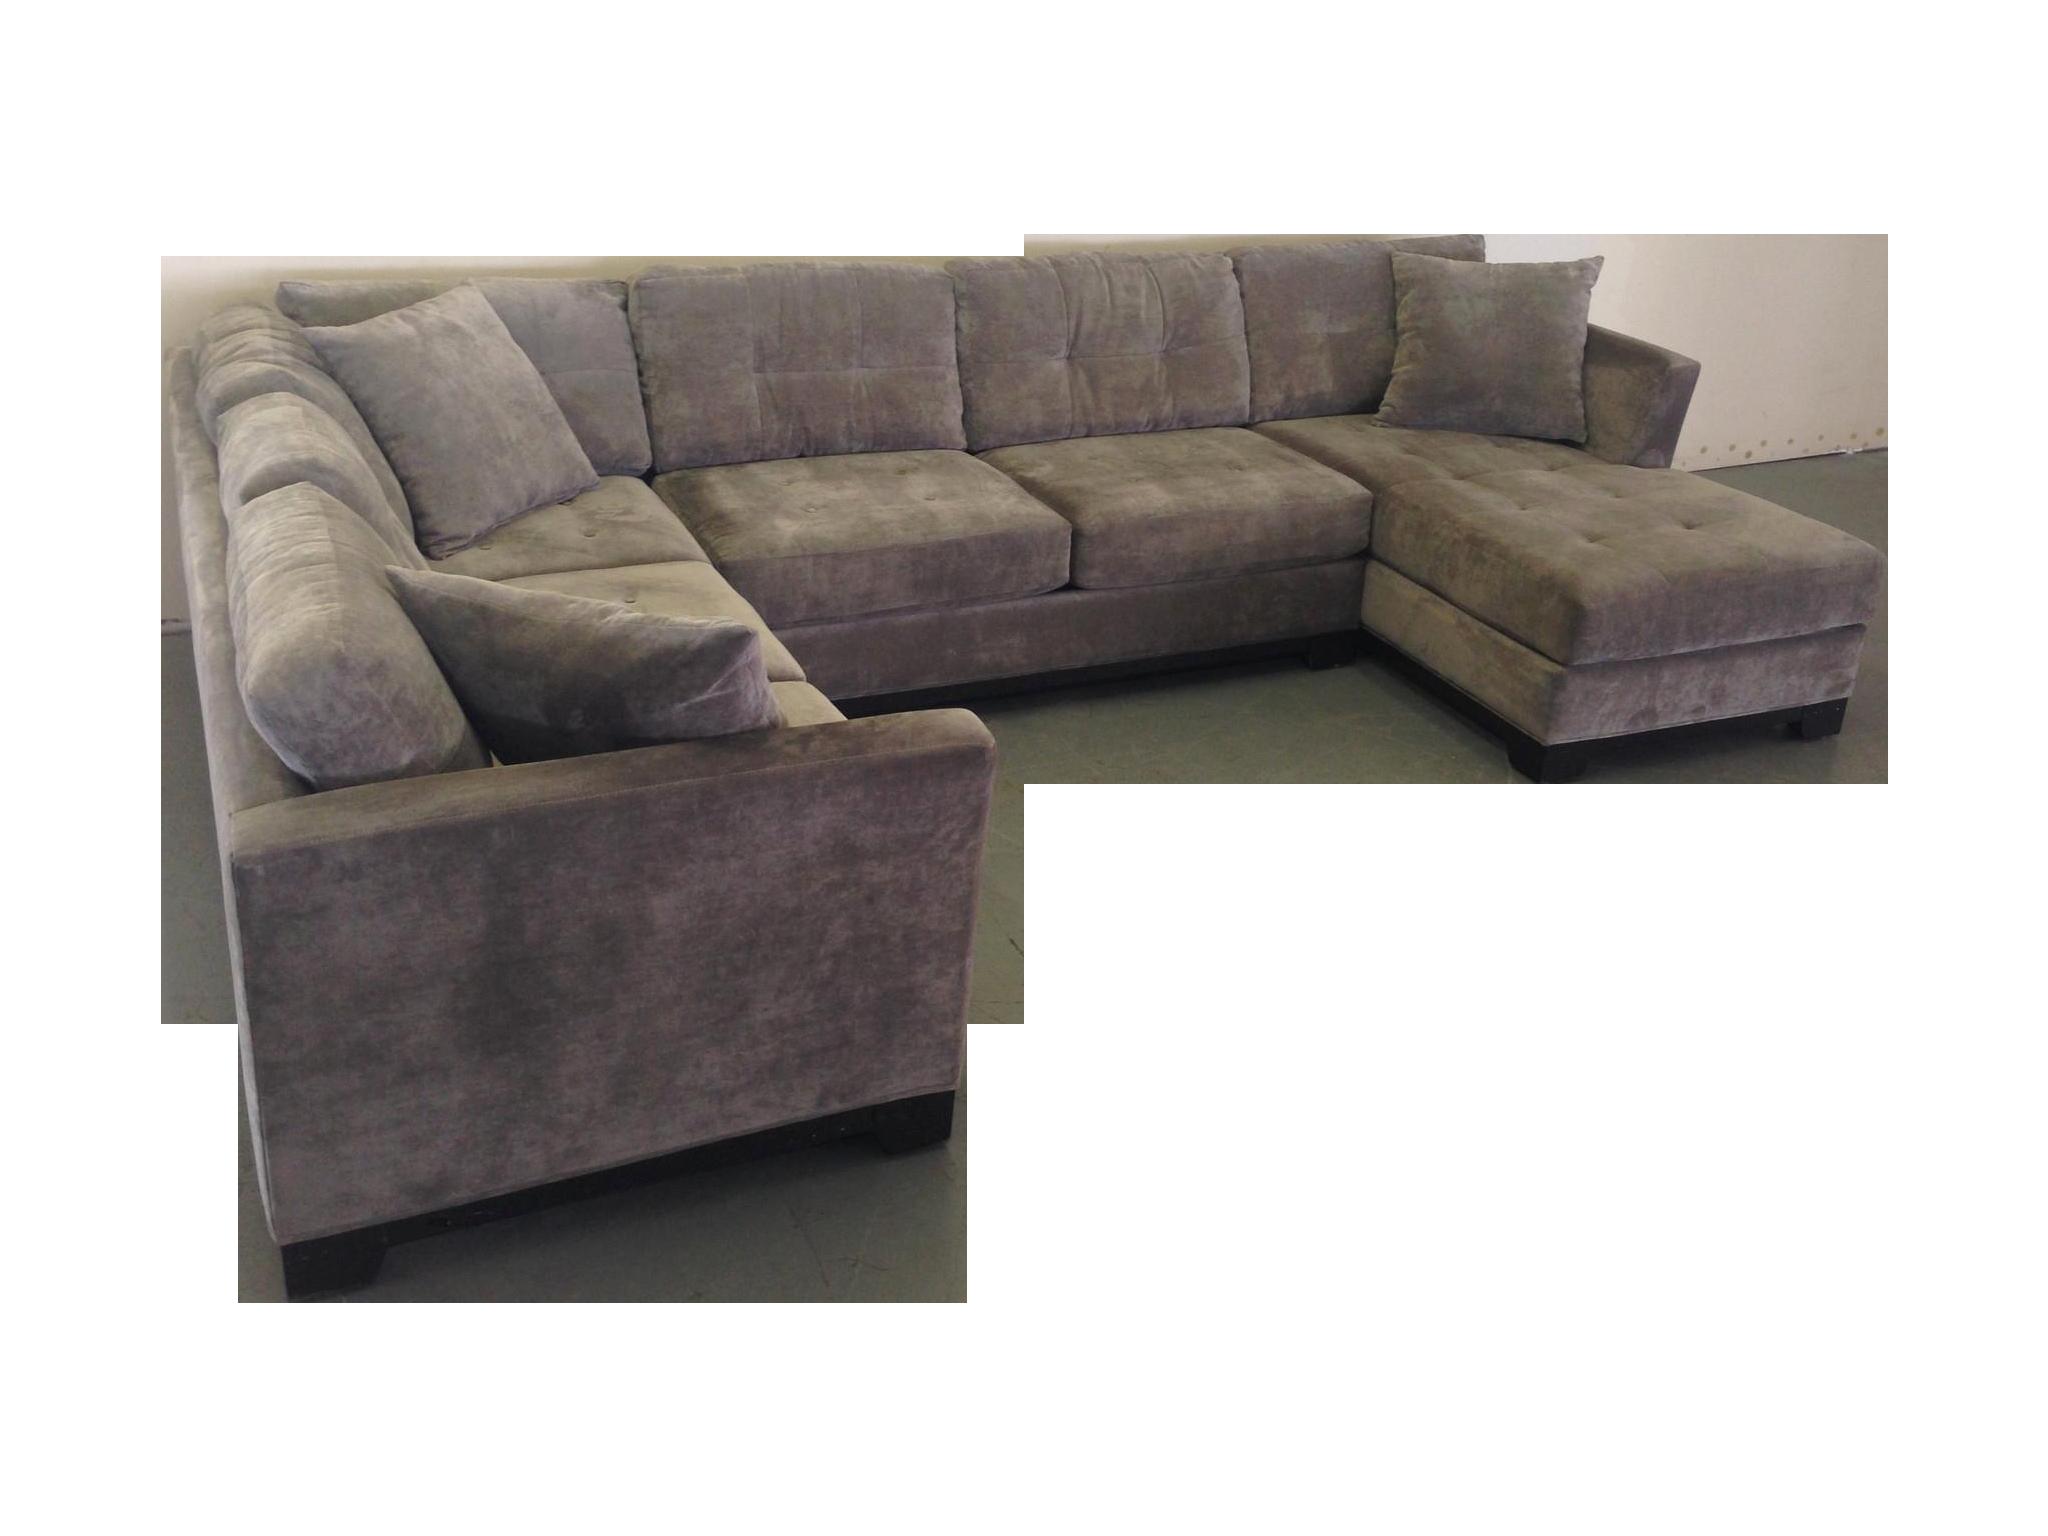 colors street ip walmart ashton bed microfiber multiple spring sofa couch com